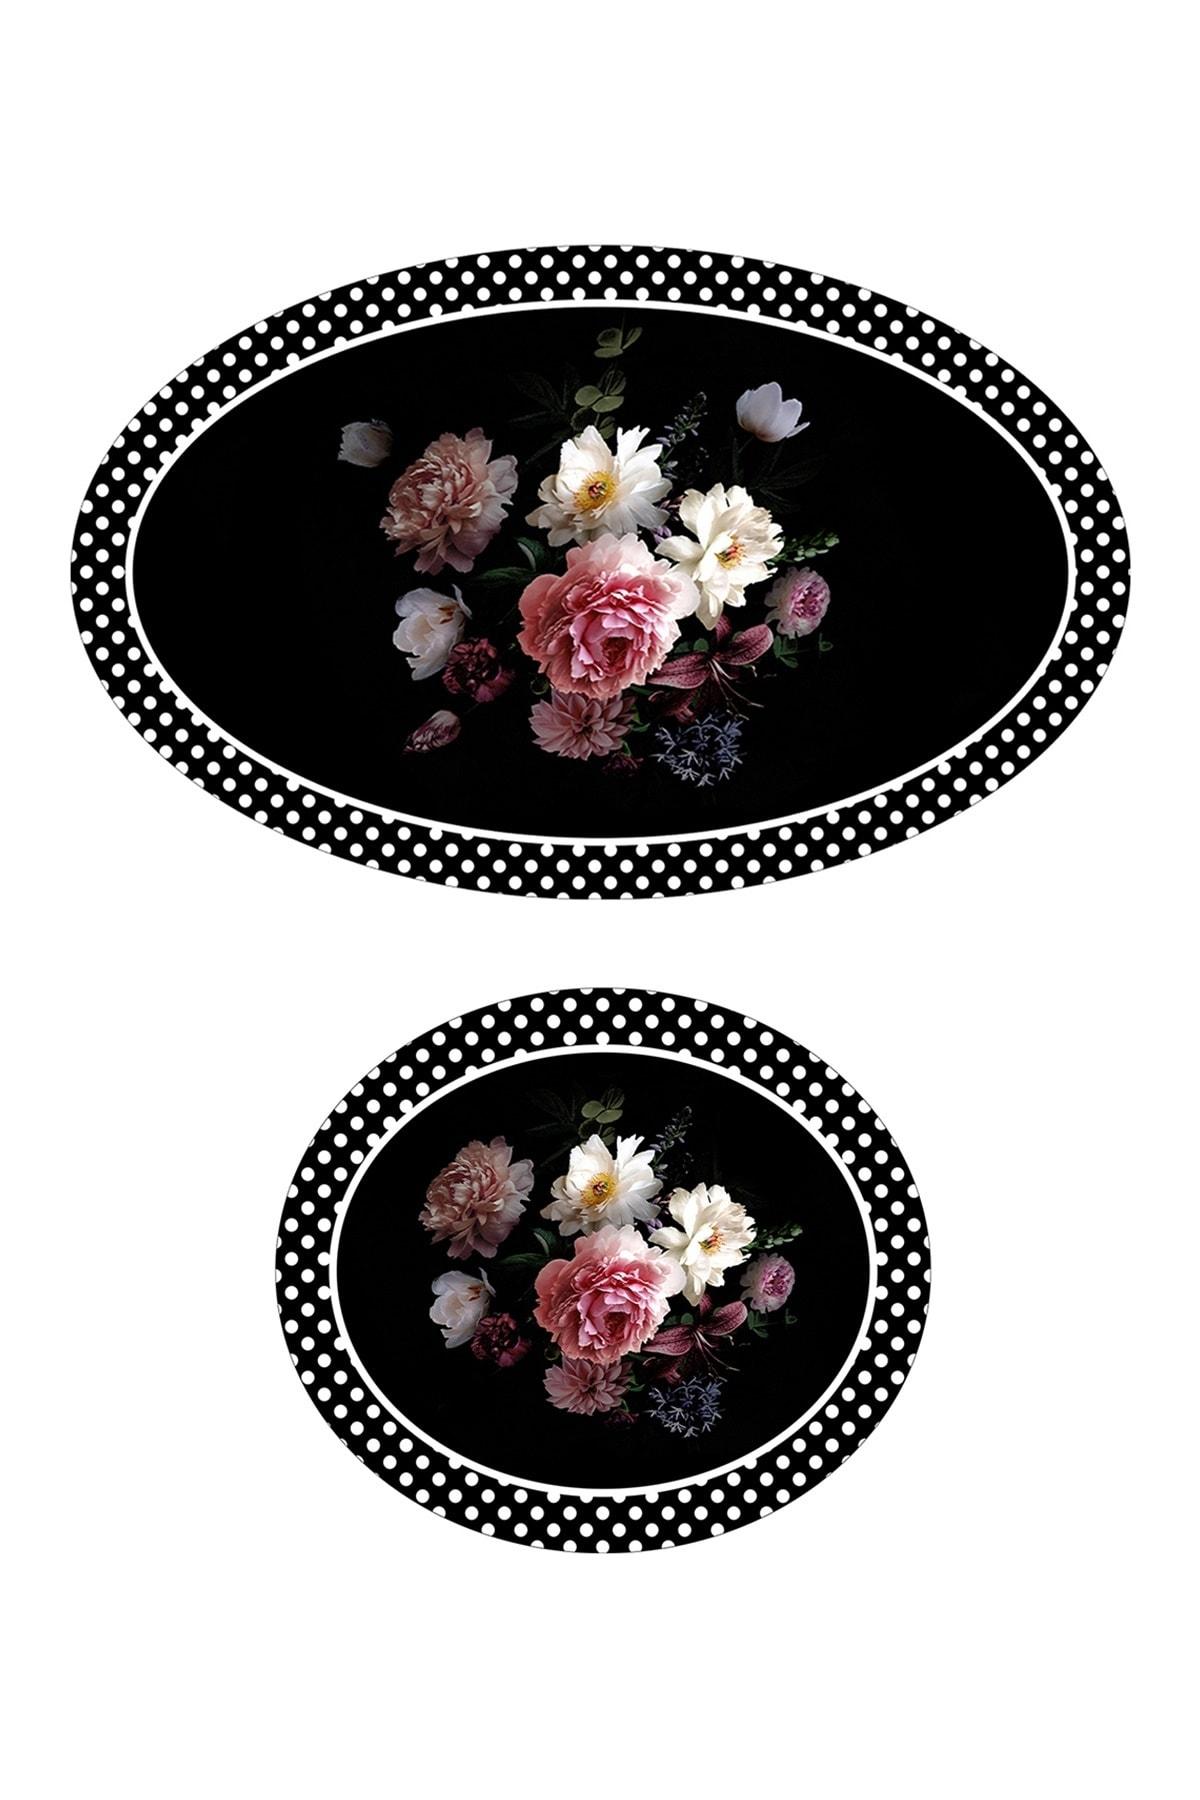 colizon 60x90 - 50x60 Rose&Black Banyo Halısı Oval Klozet Takımı 2'li Paspas Seti 2